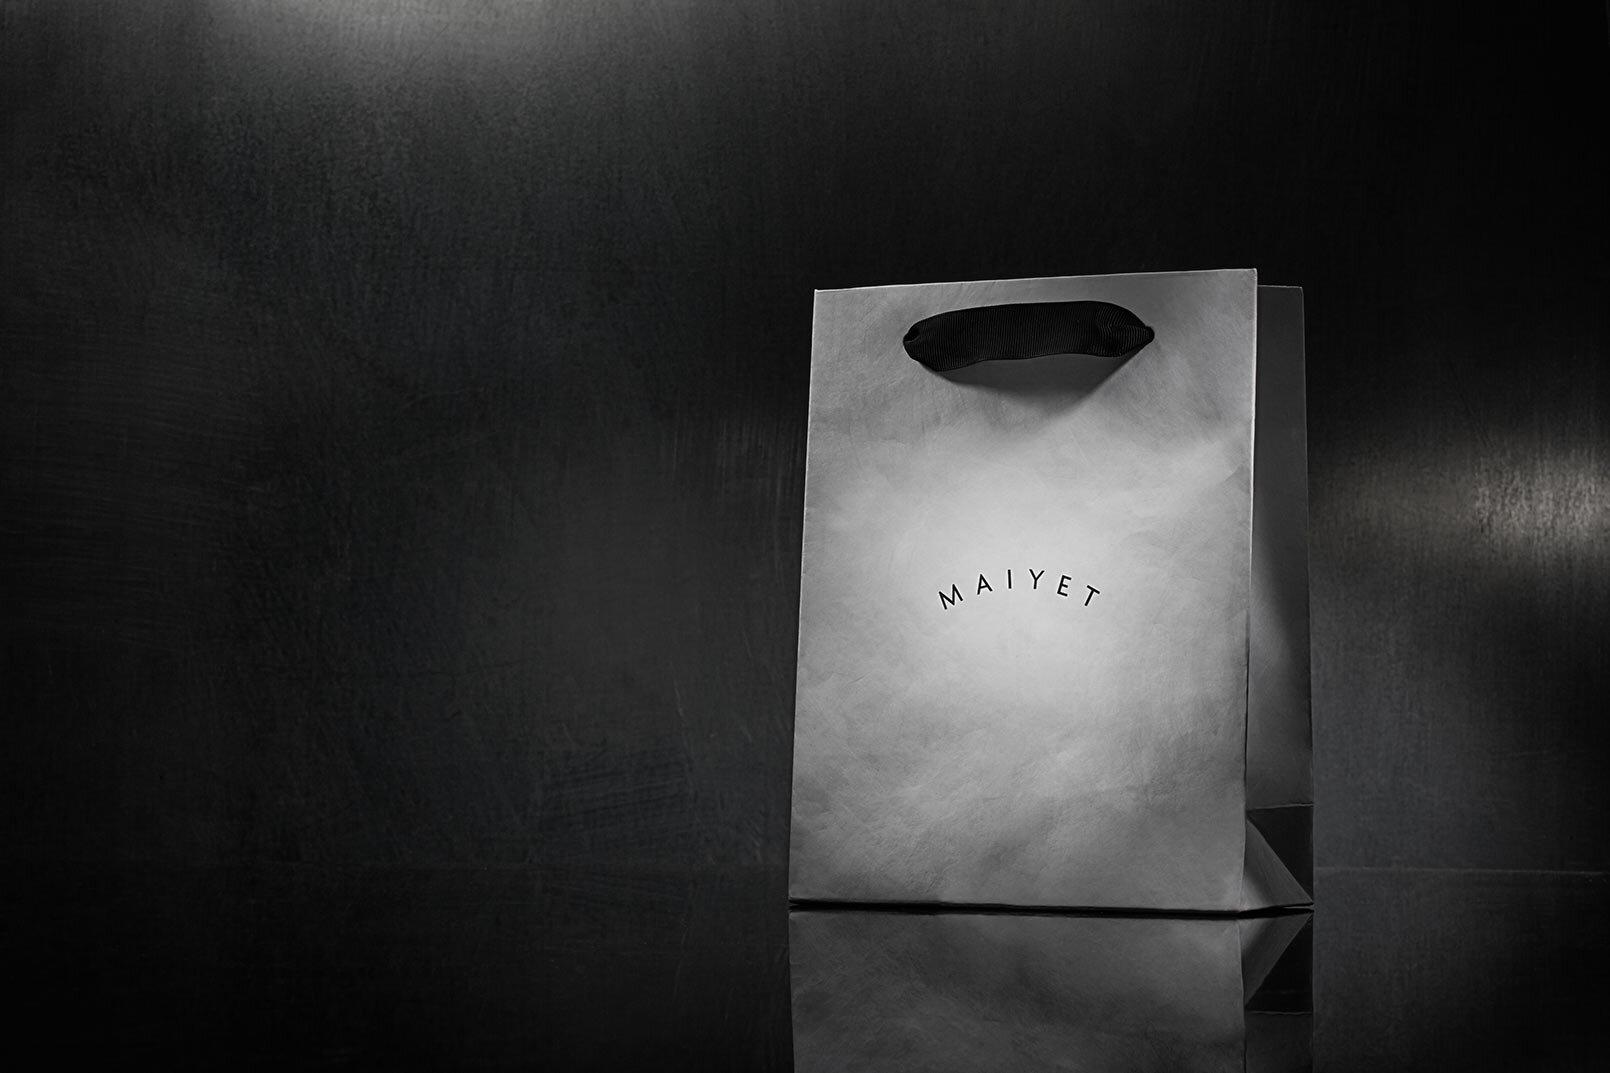 Maiyet-Shopping-Bag-Design-Packaging-Company-1.jpg